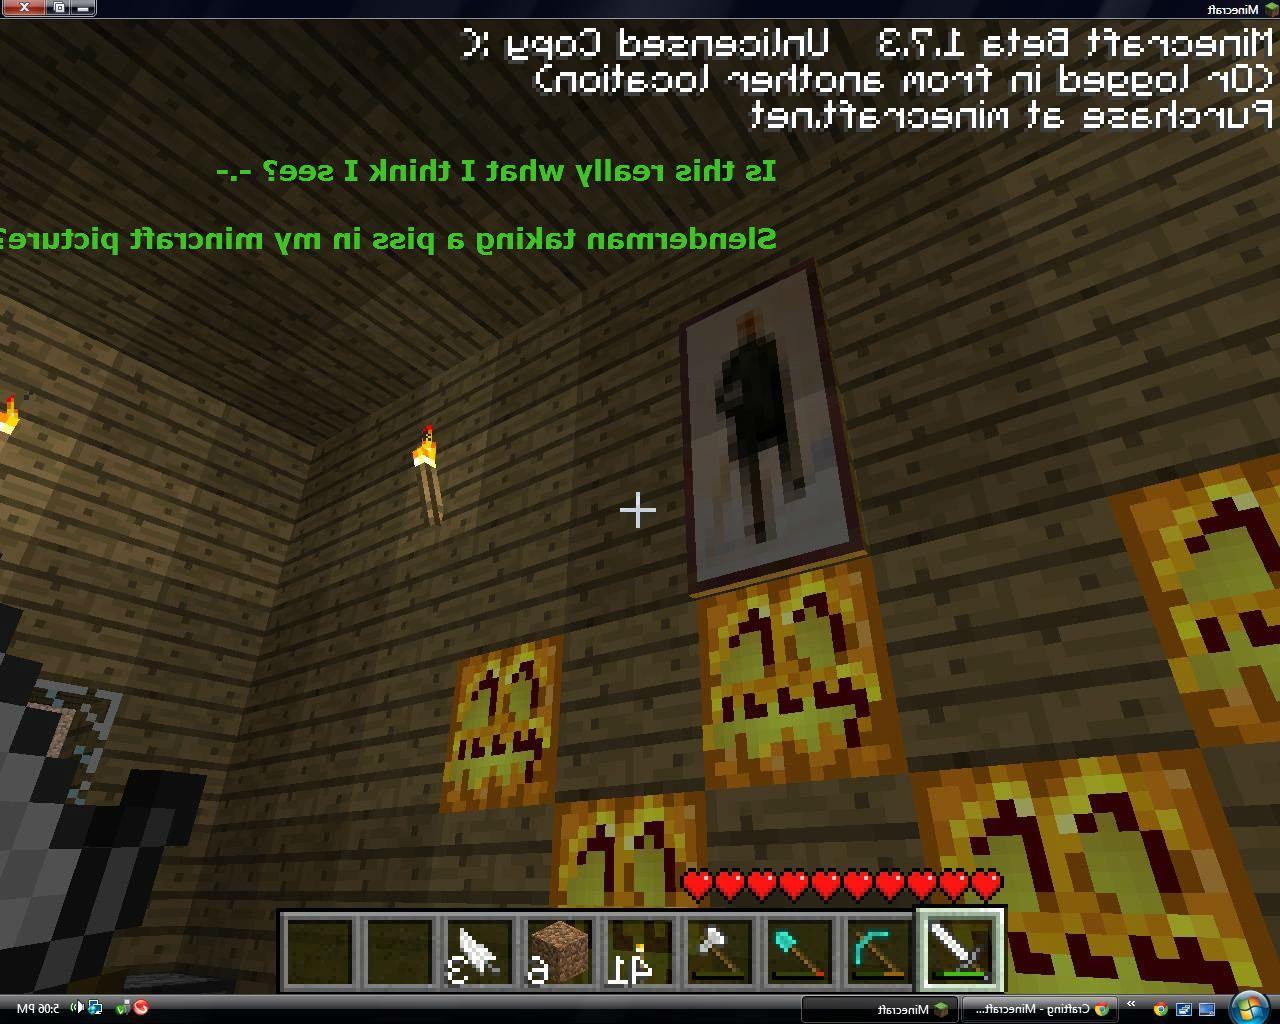 Amazing Wallpaper Minecraft Real Life - c5a721df0e36c7832c1b2e1570f9b032  Graphic_95584.jpg